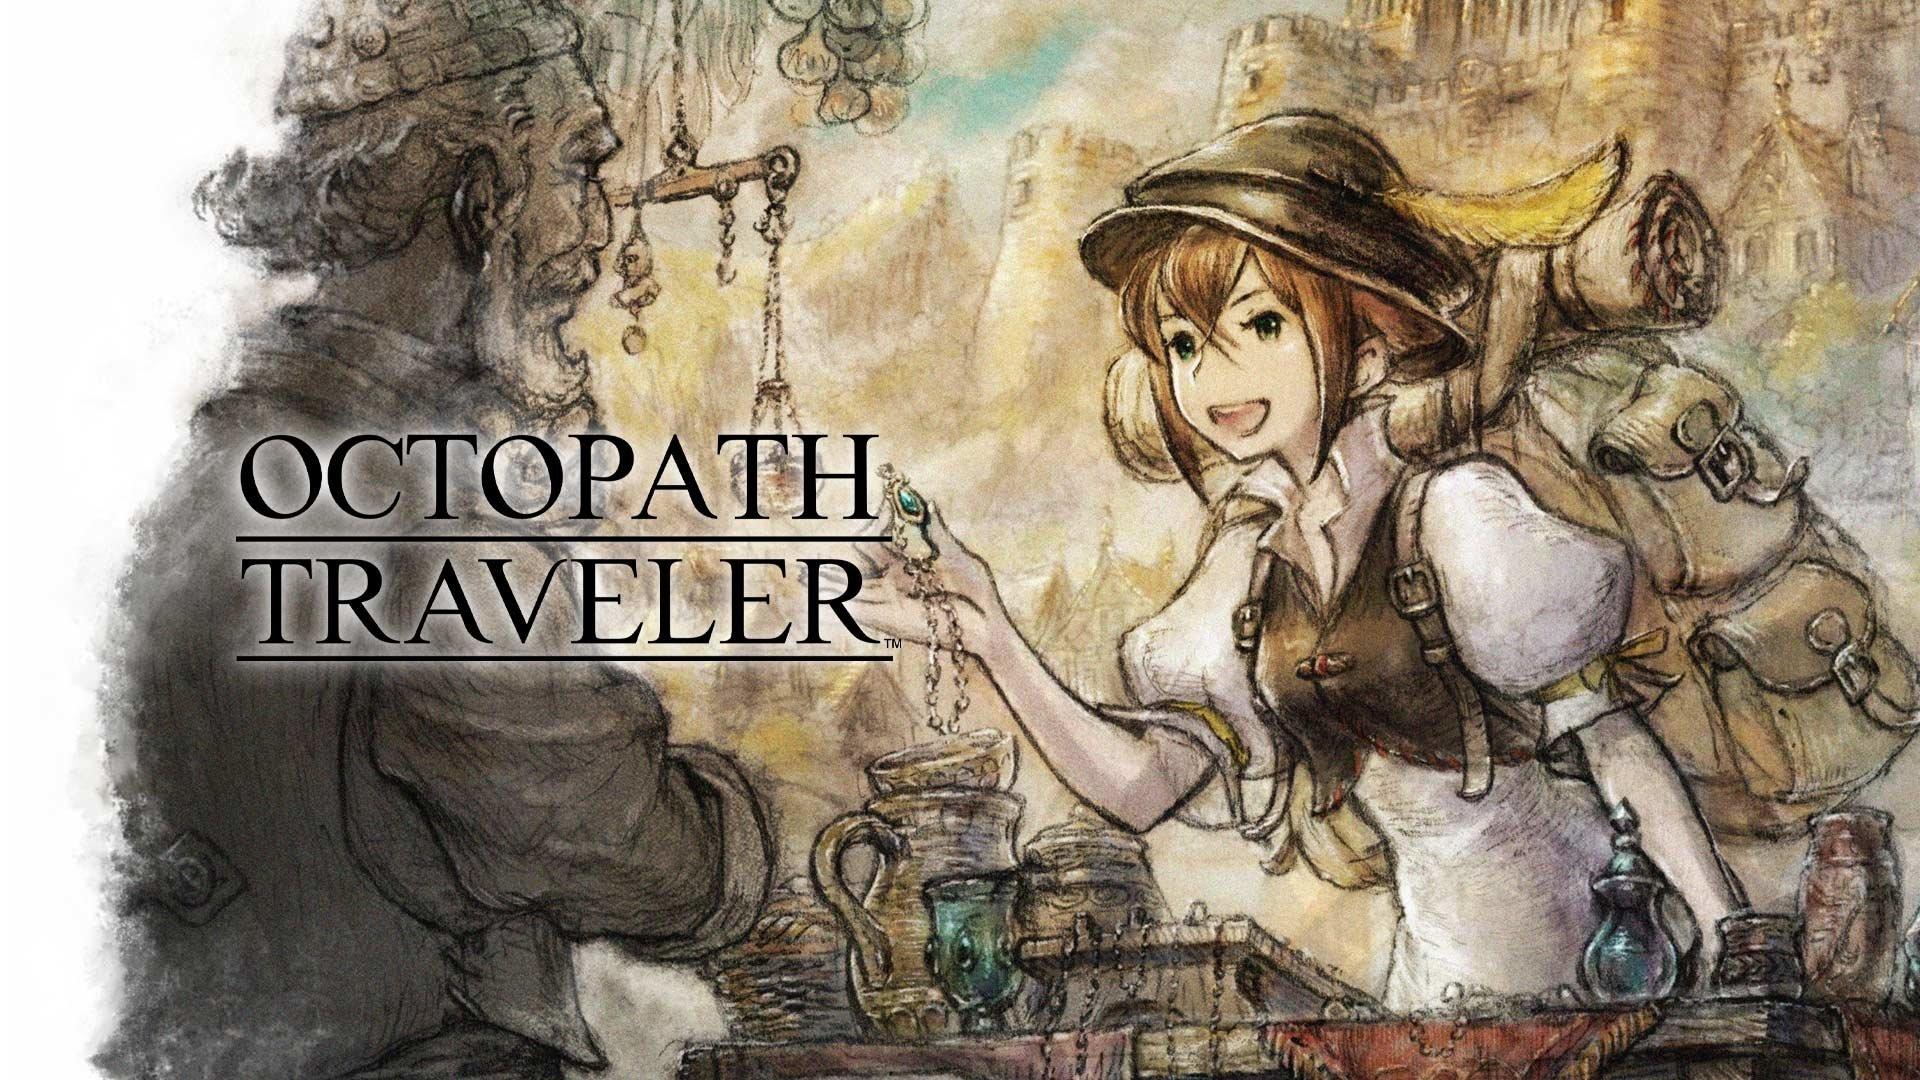 Octopath Traveler HD Wallpaper | Background Image ...